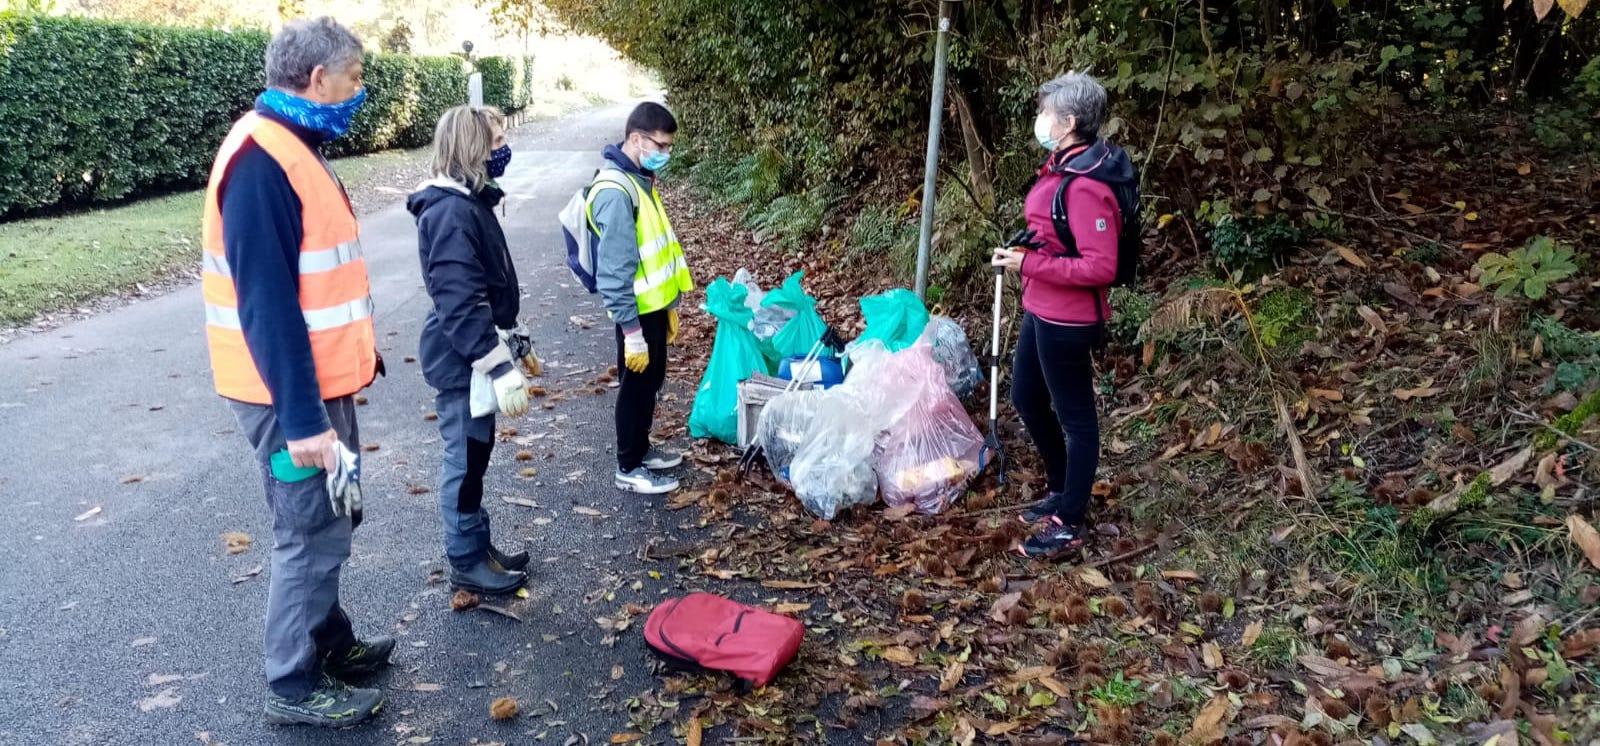 raccolta rifiuti mandane capiago intimiano 25 ottobre 2020